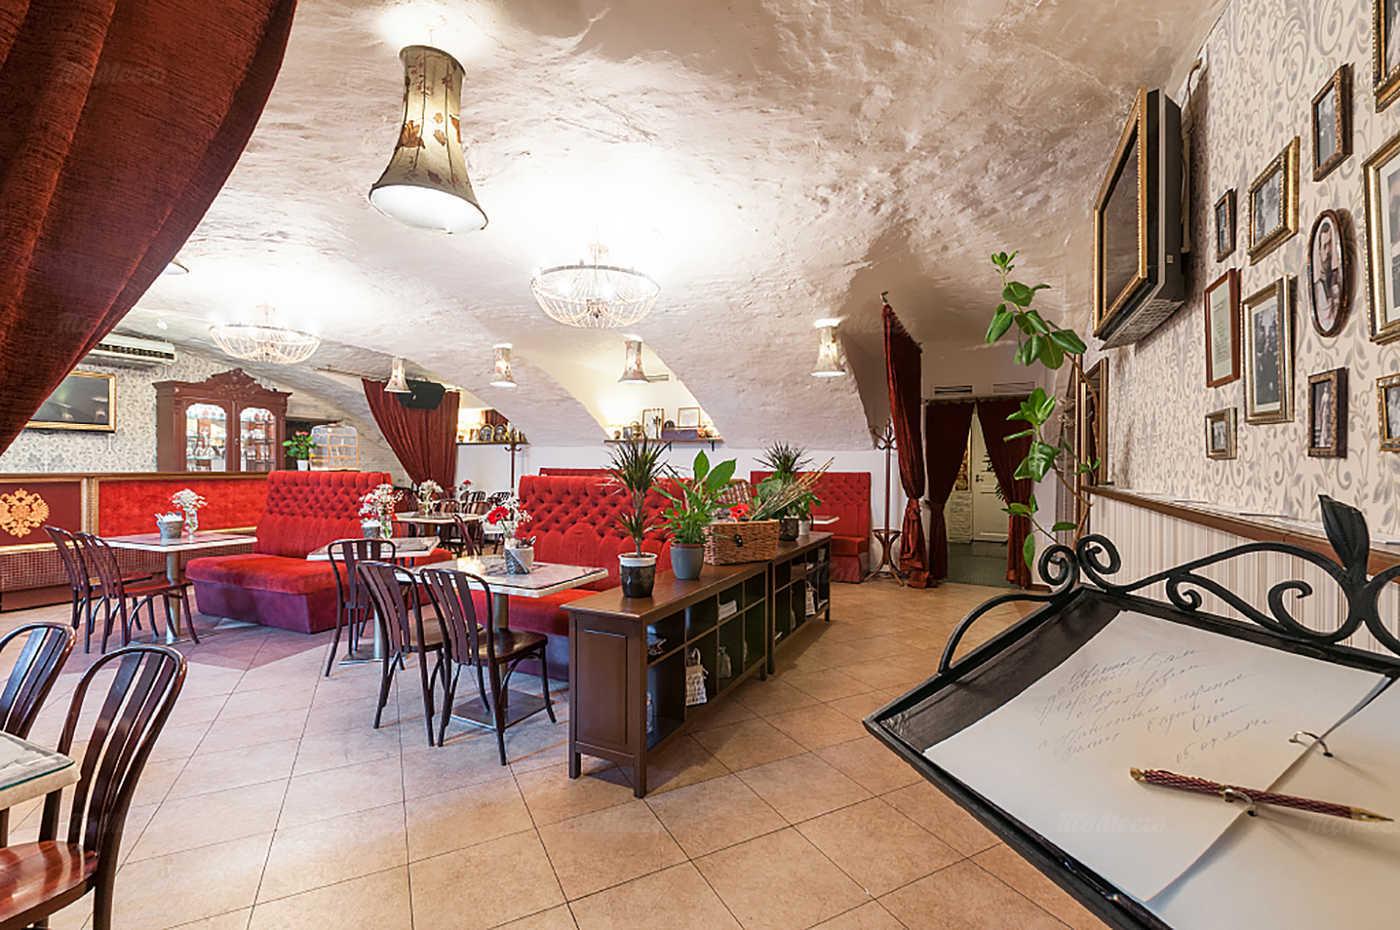 Меню кафе, ресторана Распутин на набережной реки Мойки